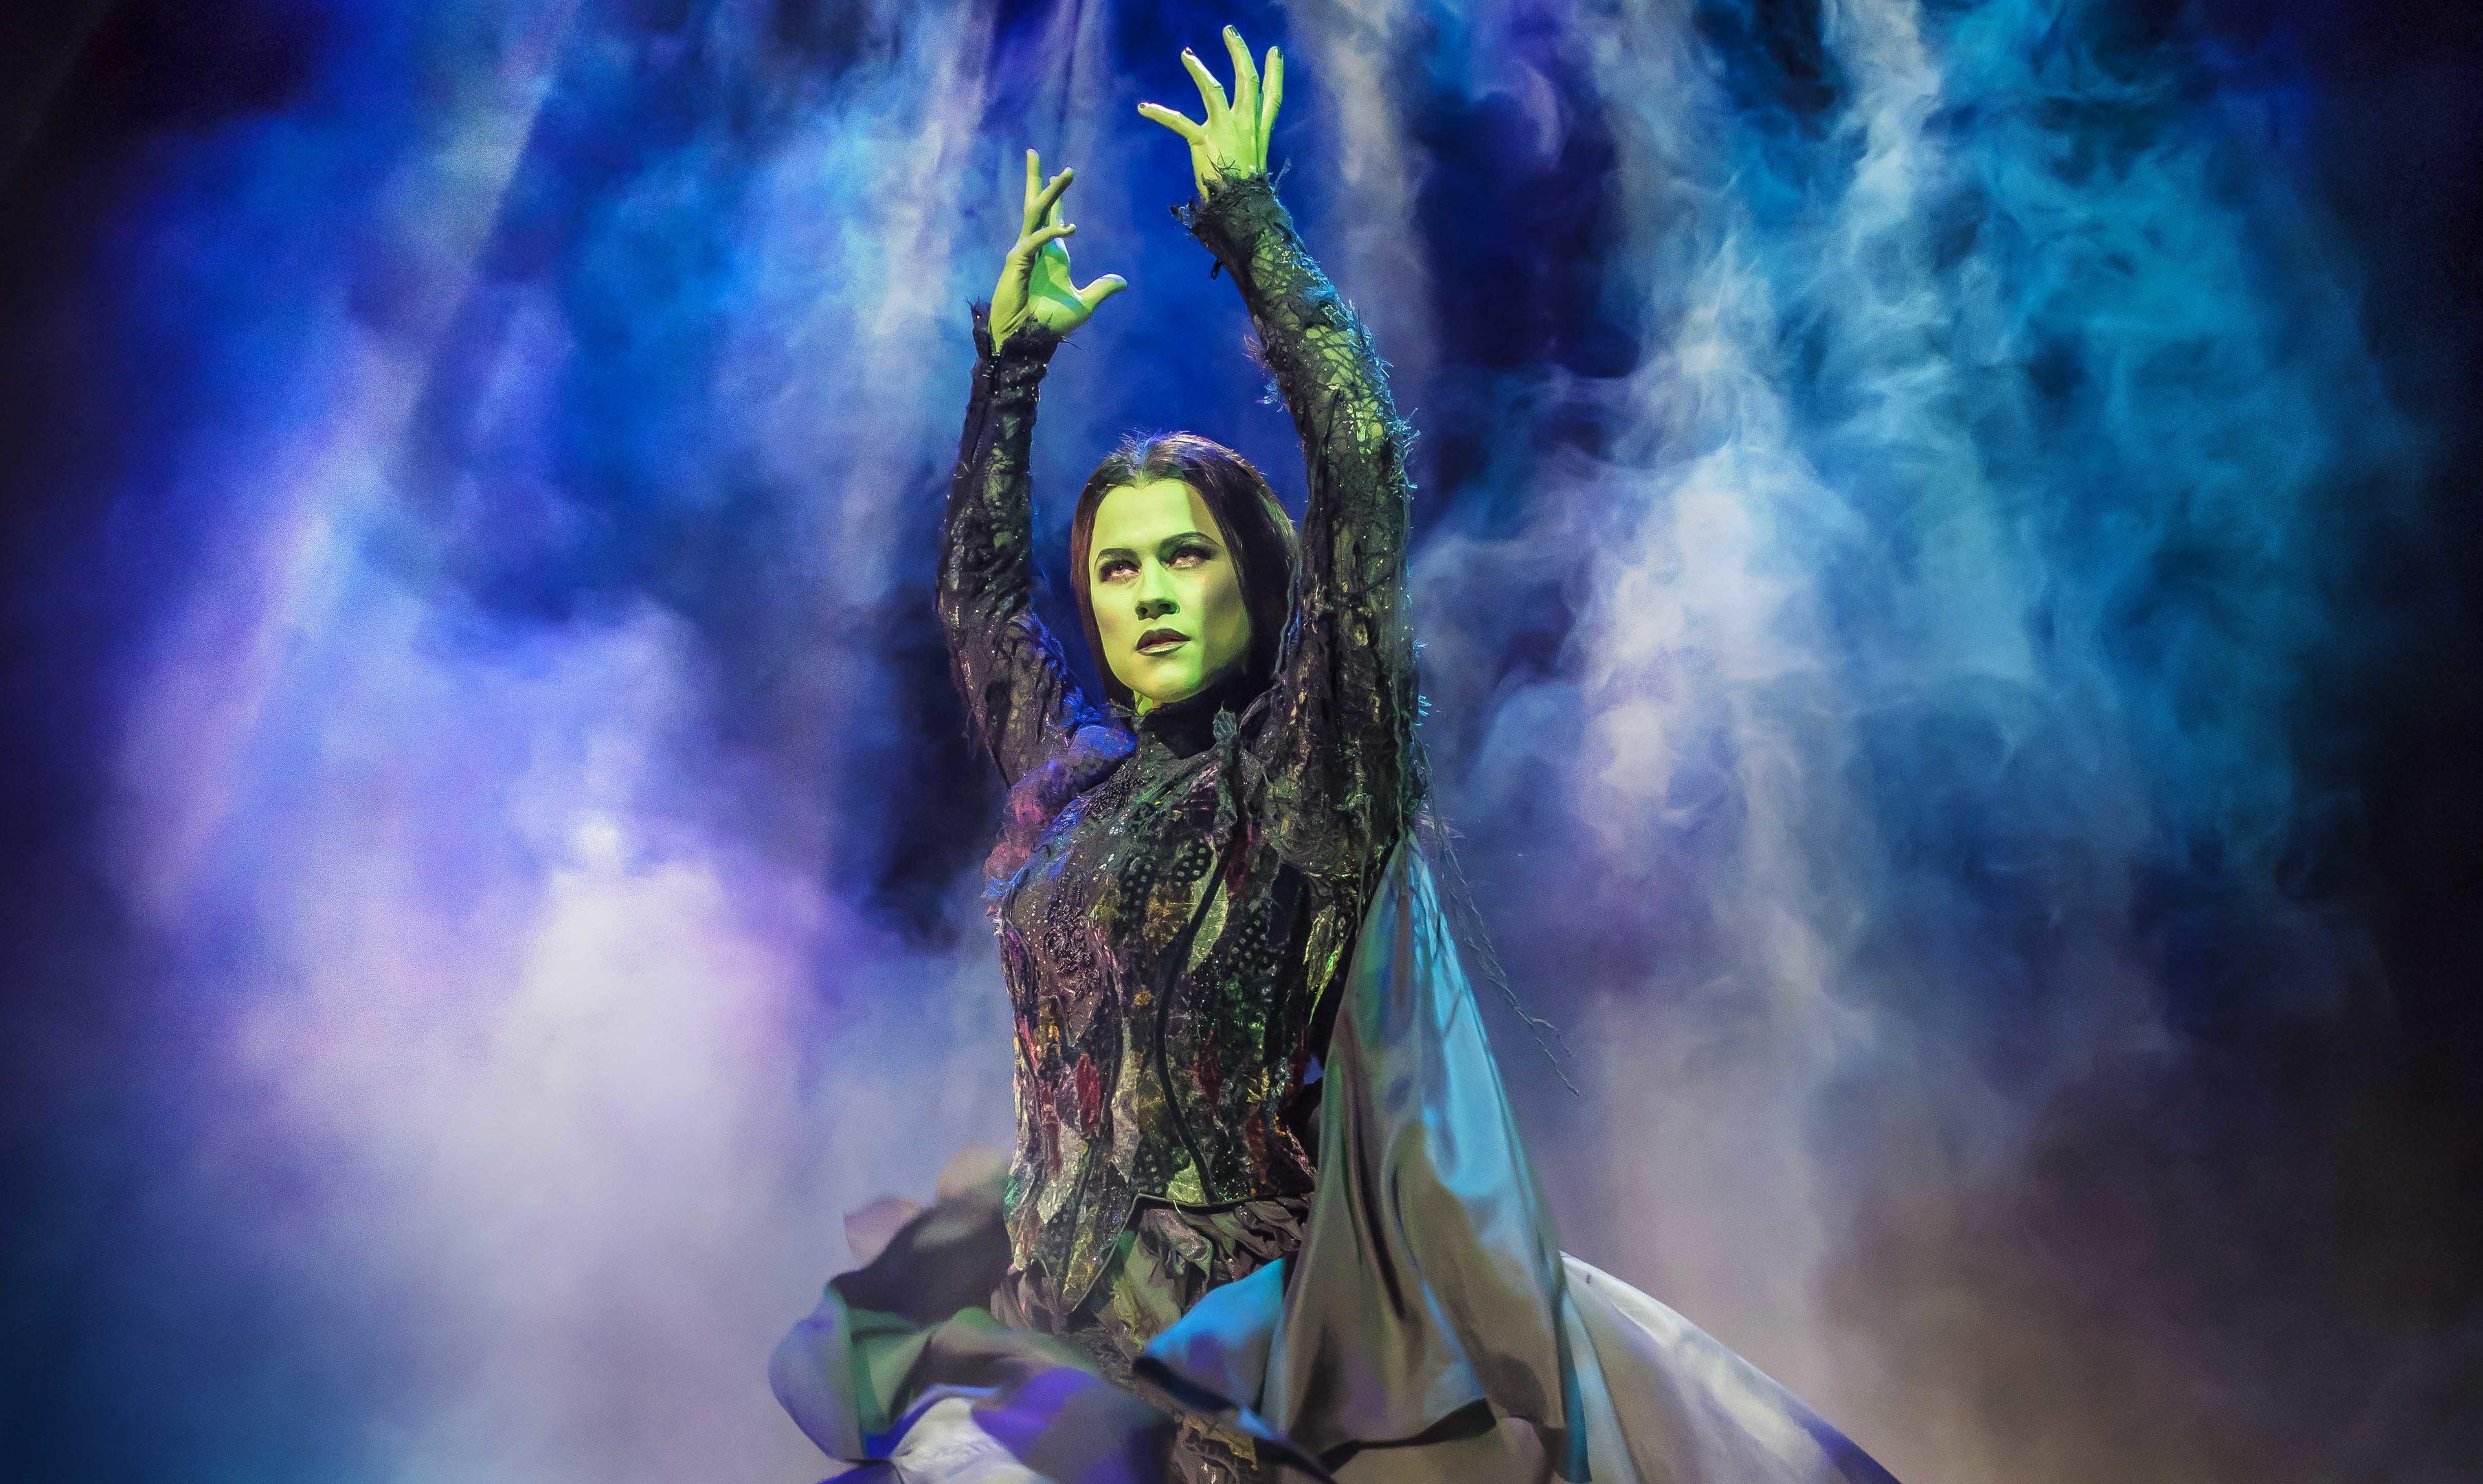 Amy Ross as Elphaba in Wicked